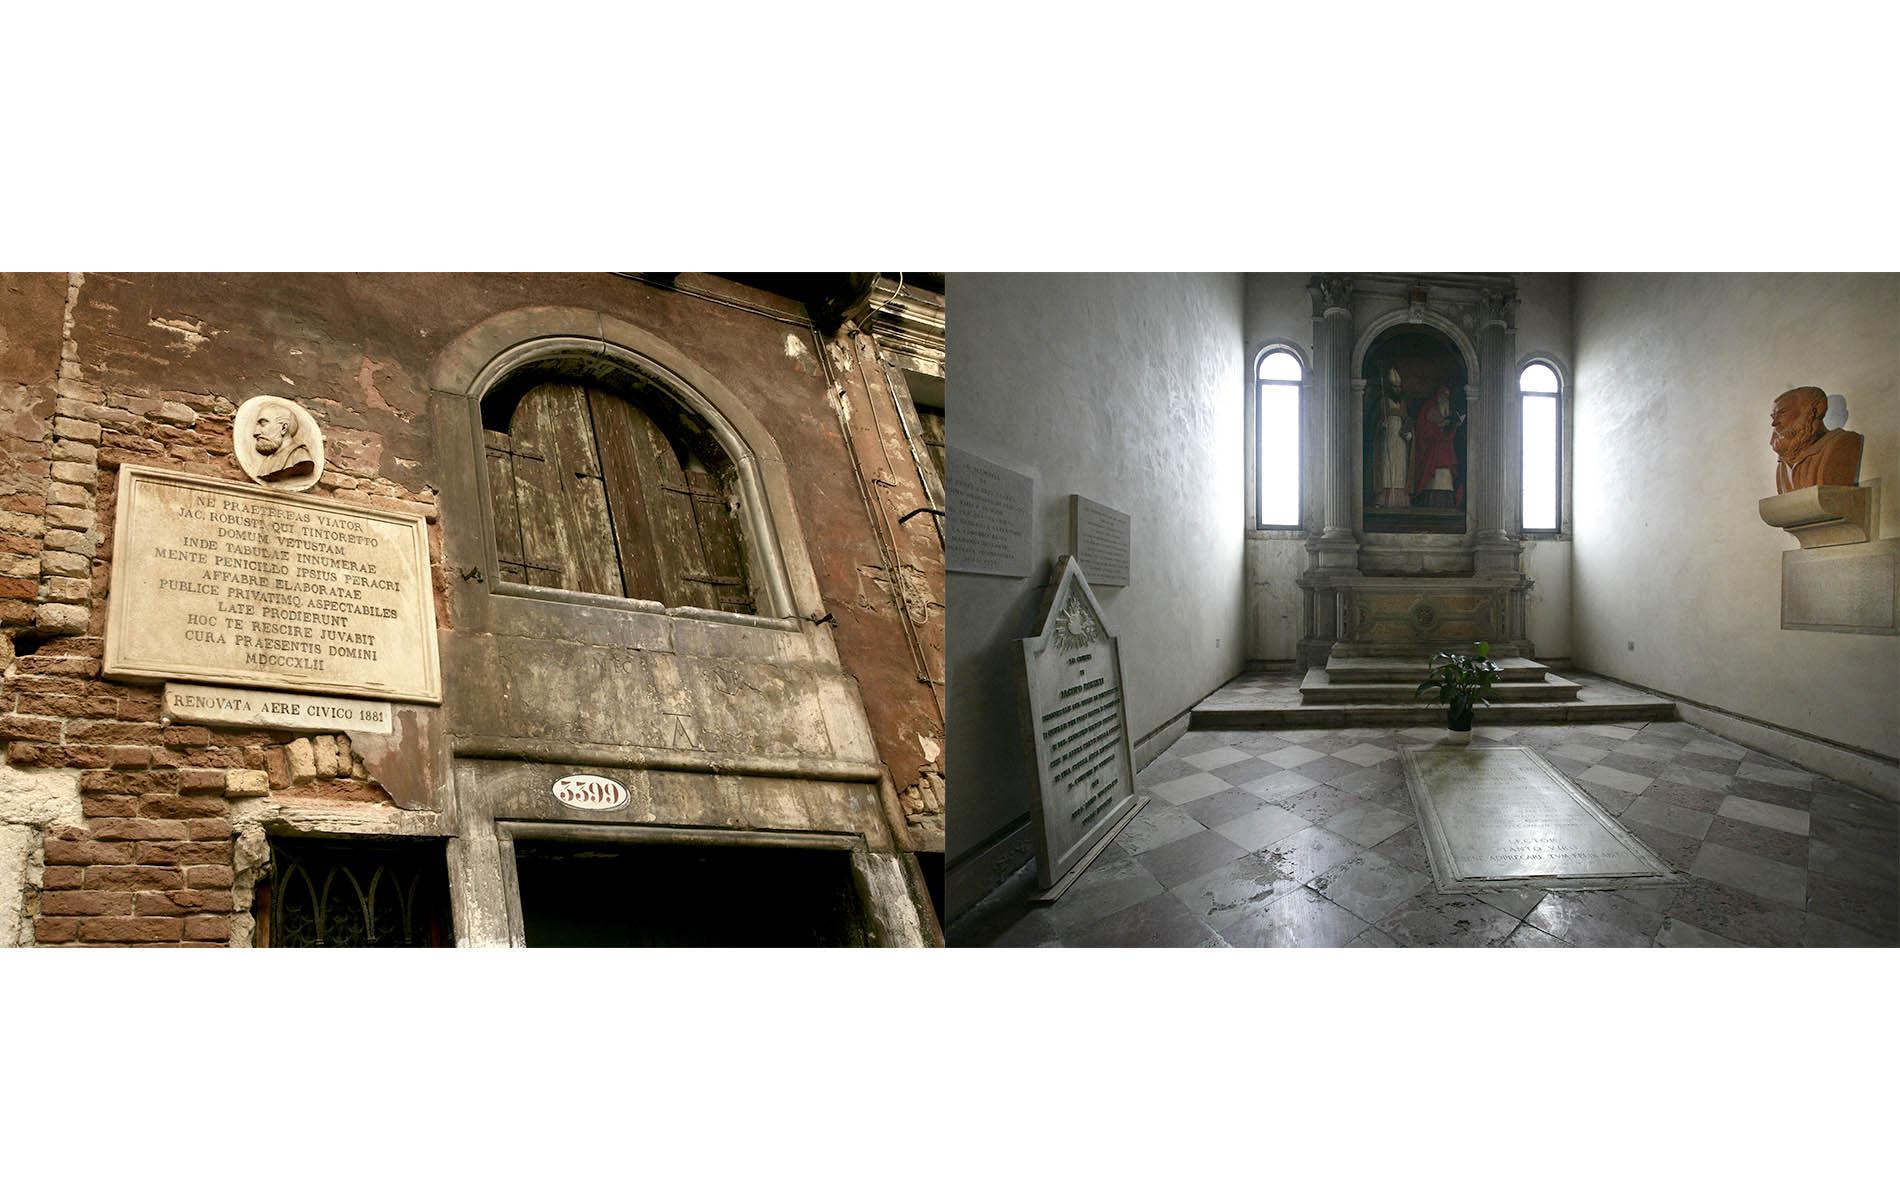 tintoretto,venecia,venice.barroco,baroque